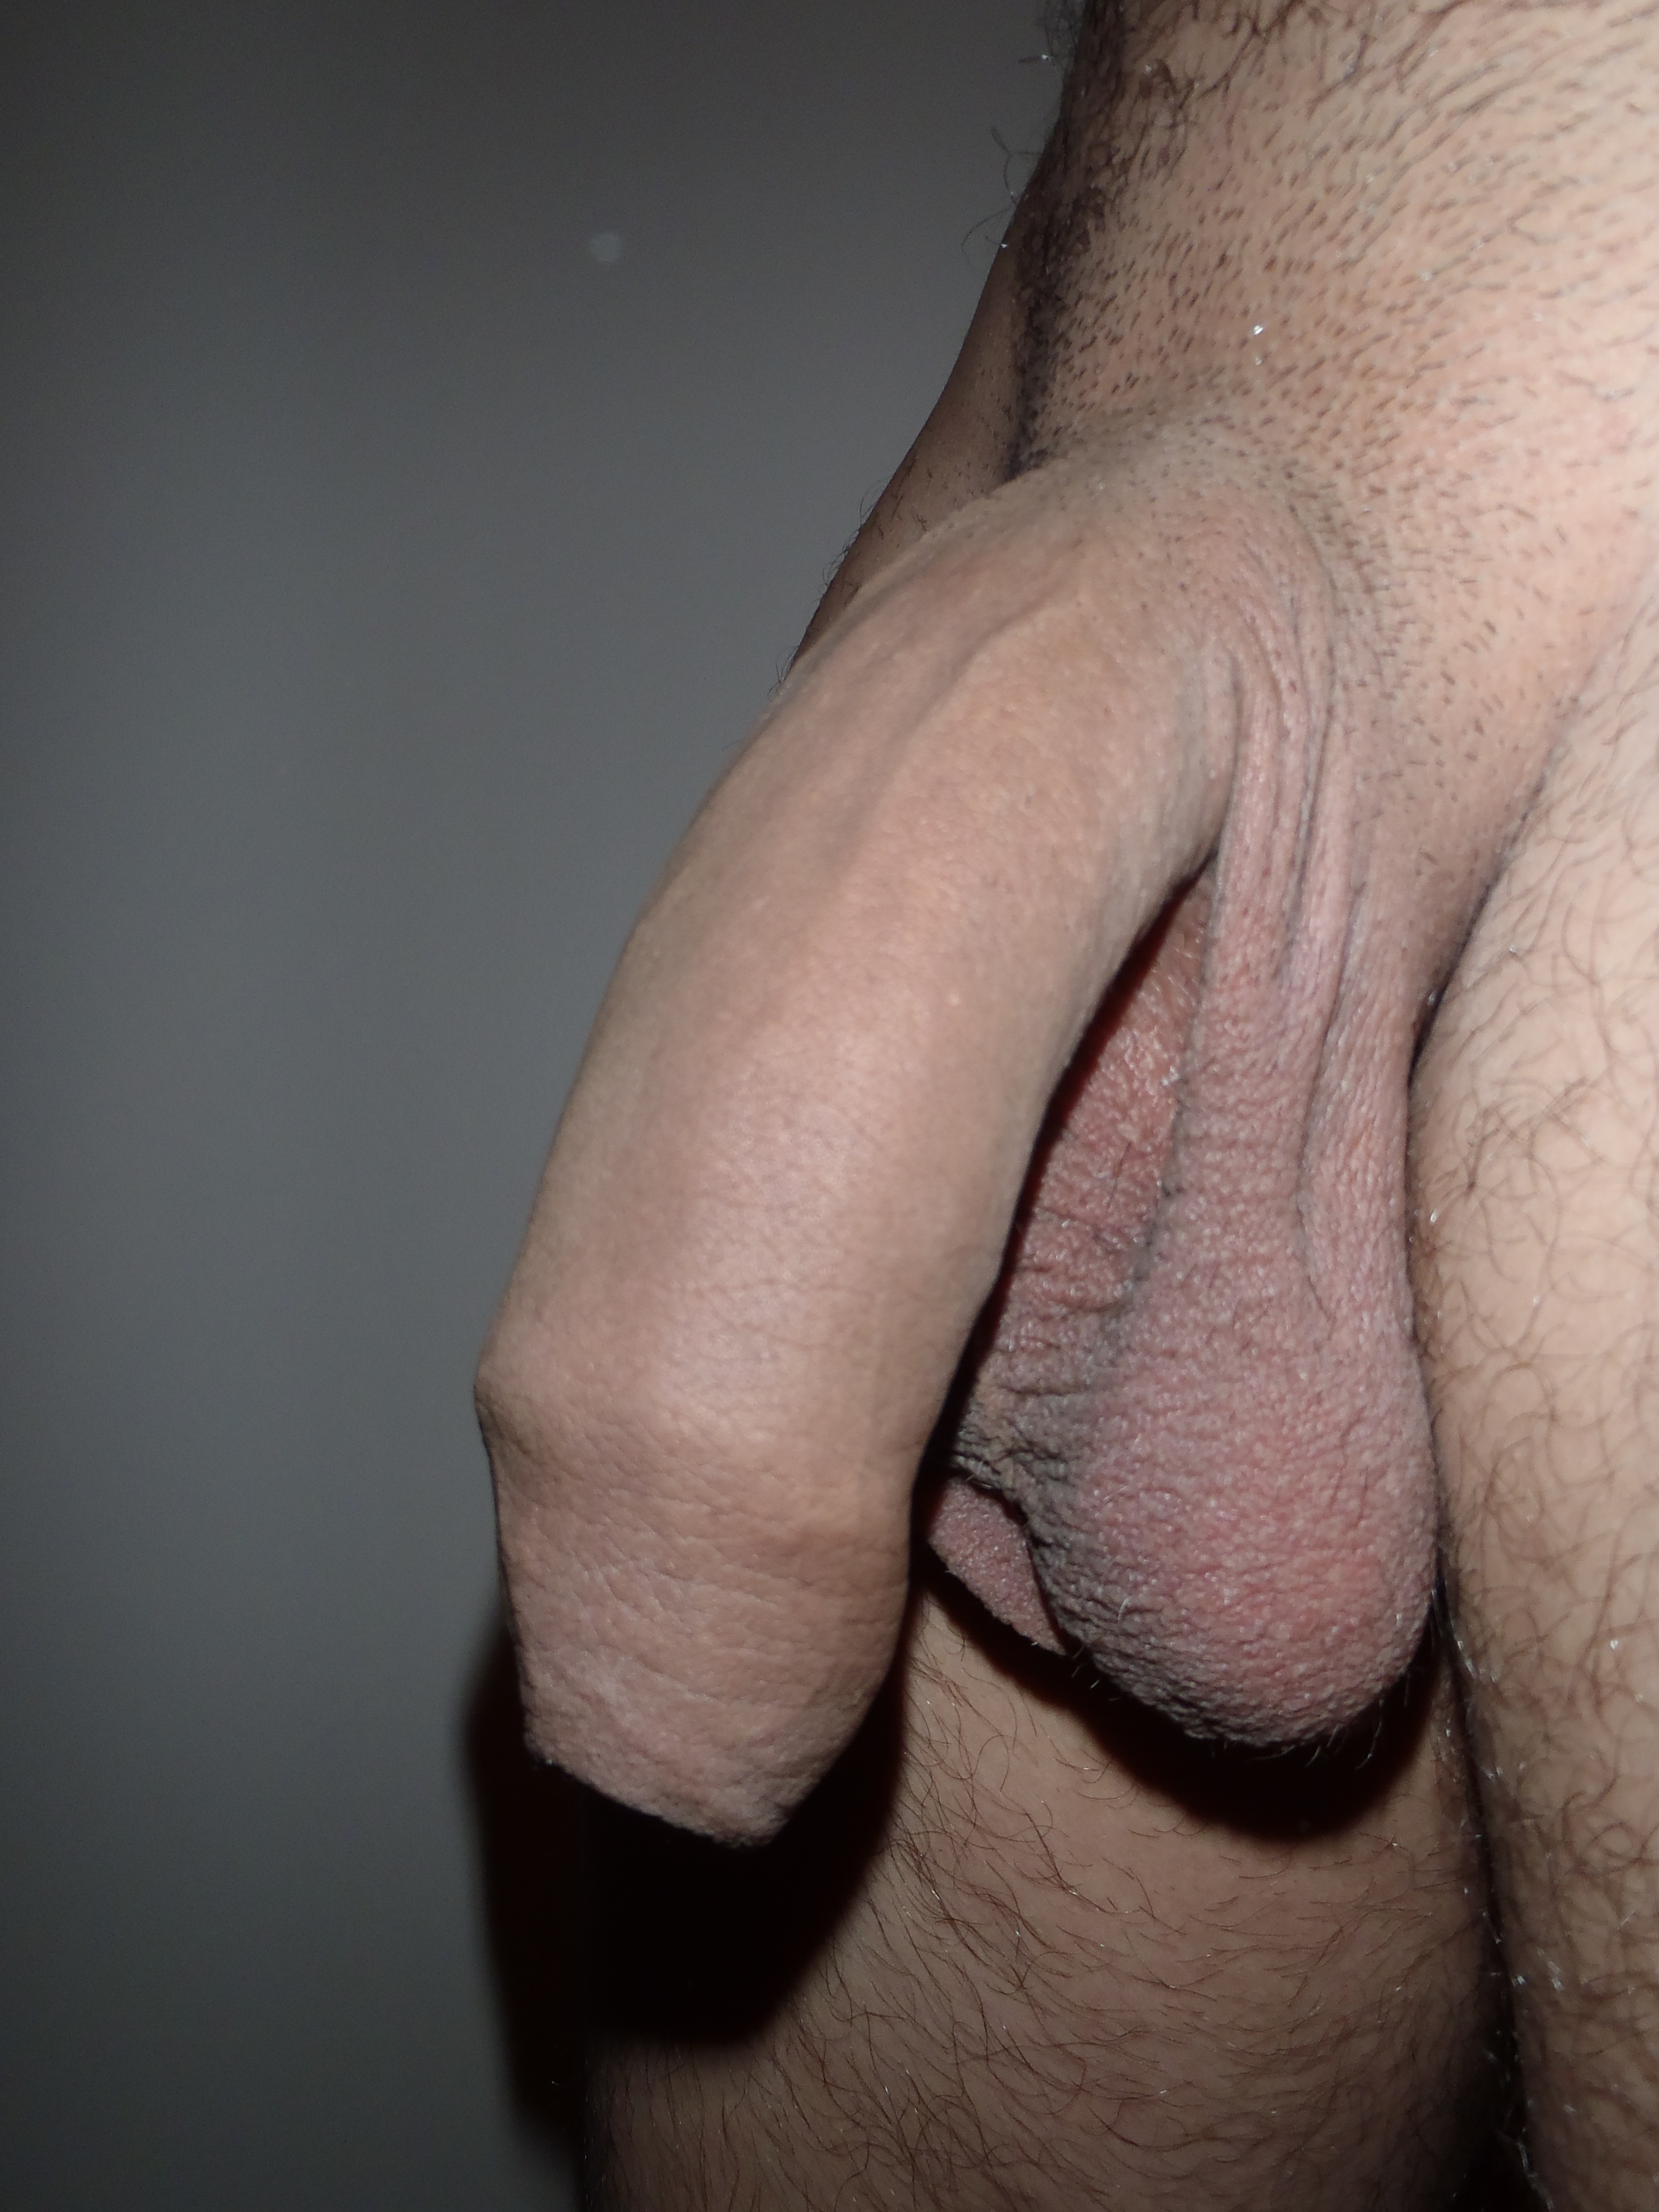 sex scene with adorable blonde chick vintage #closeup #cockpic #softcock #penis #amateur #uncut #balls #shavedcock #shavedballs #cock